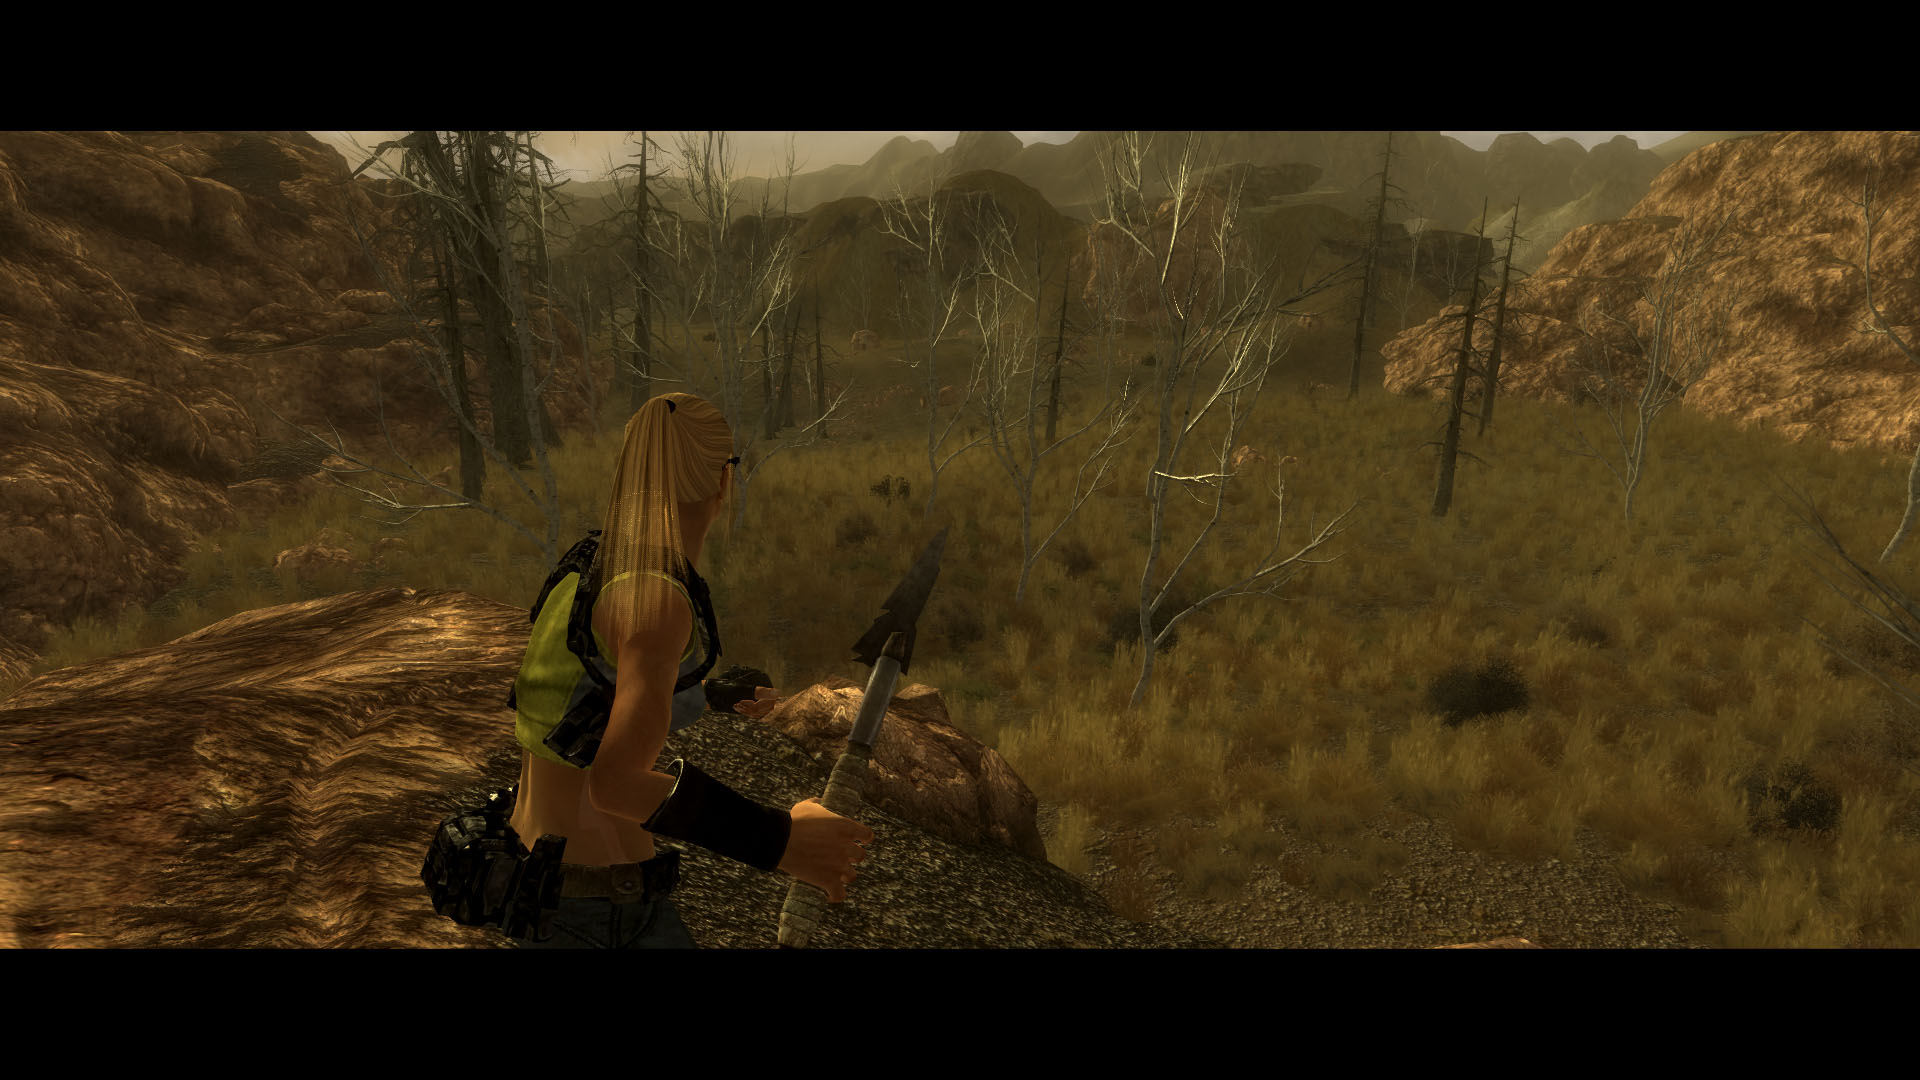 Fallout 3 porn machinima porncraft image